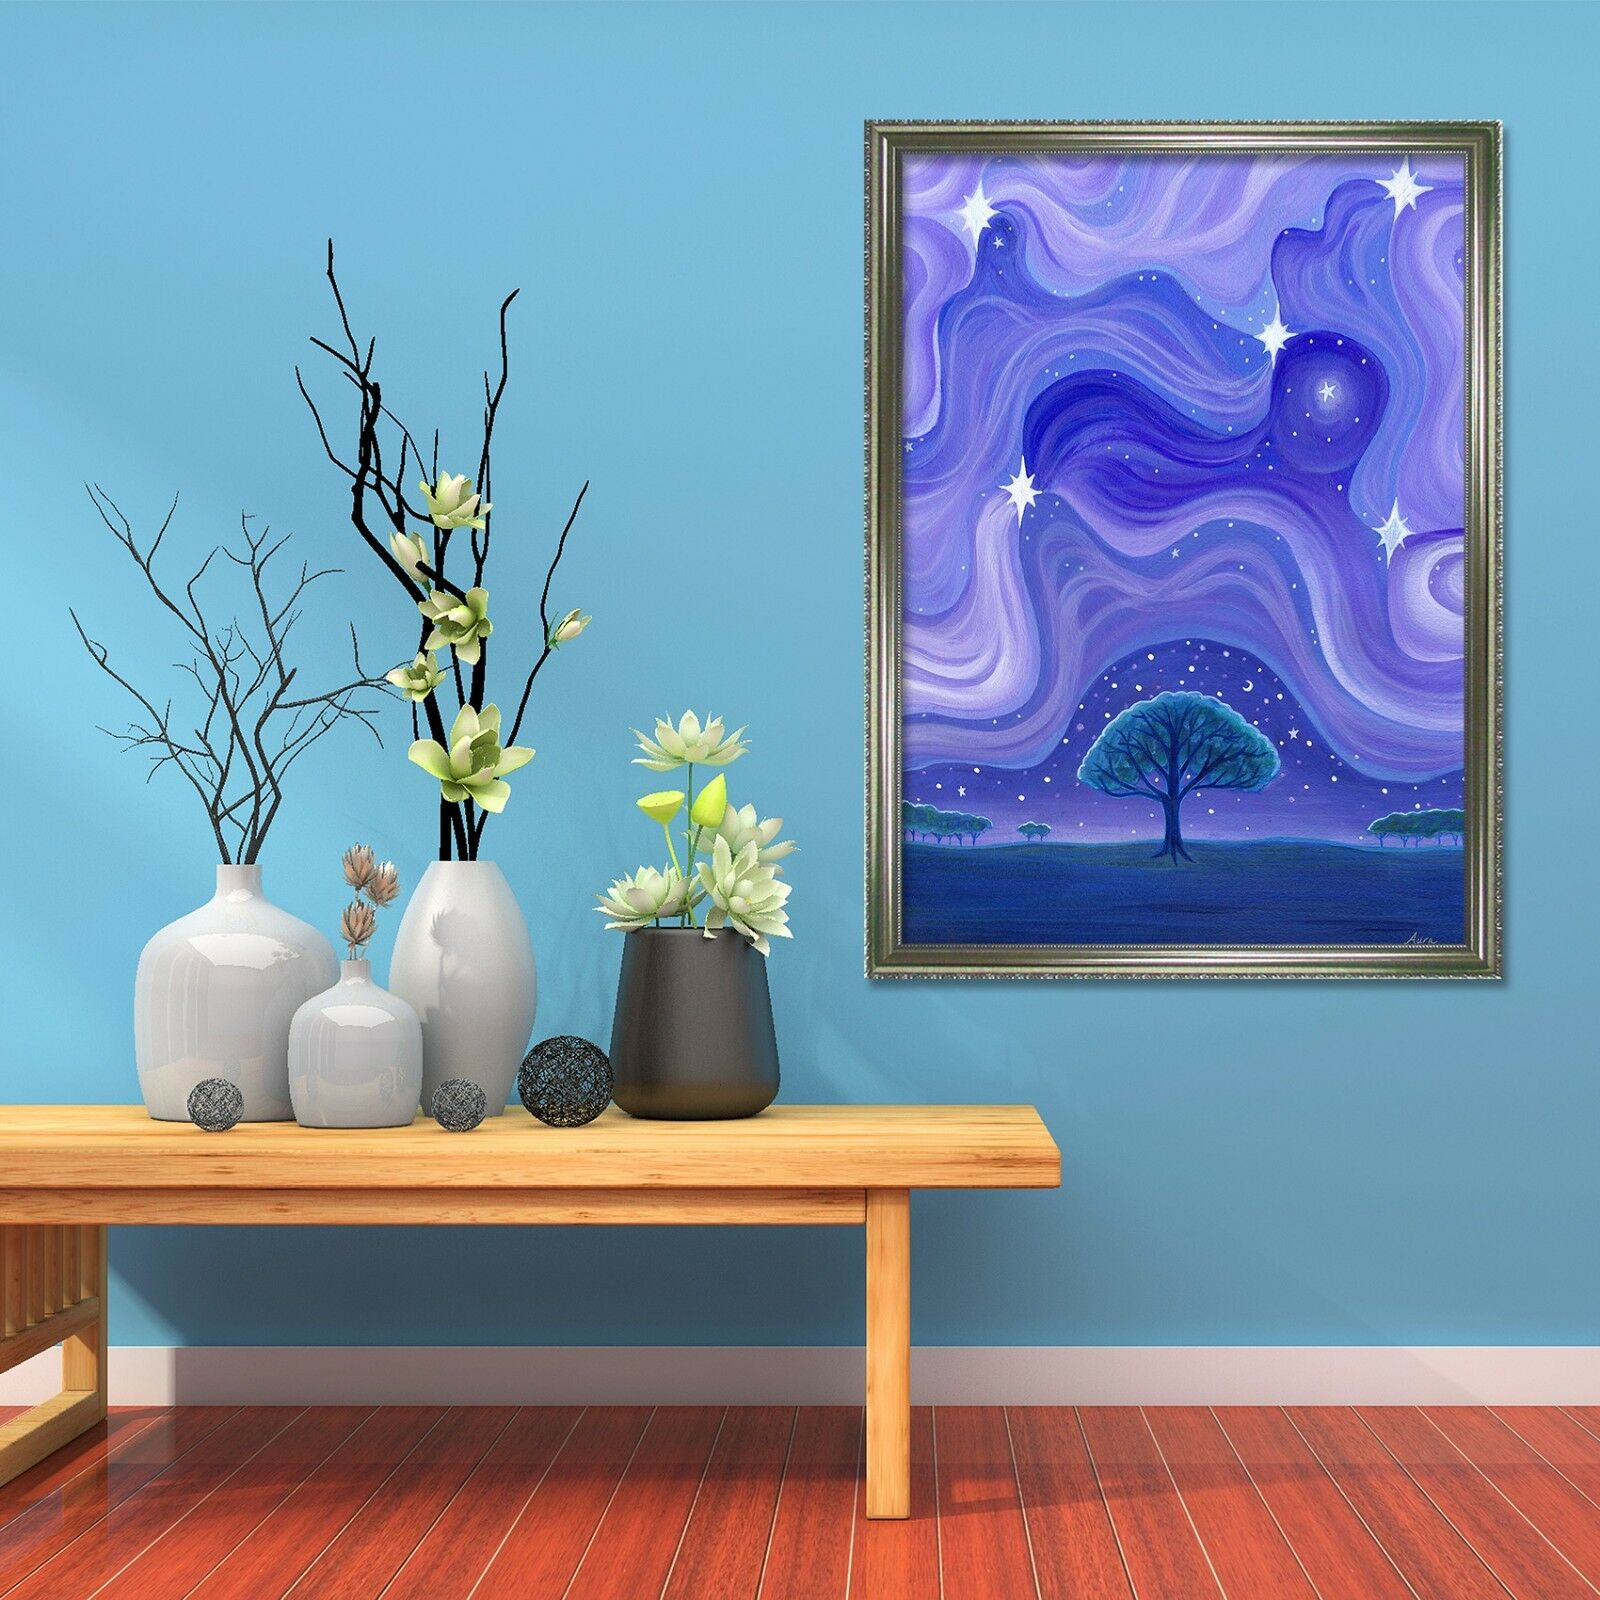 3D Blau Vortex 6 Framed Poster Home Decor Print Painting Art AJ AU